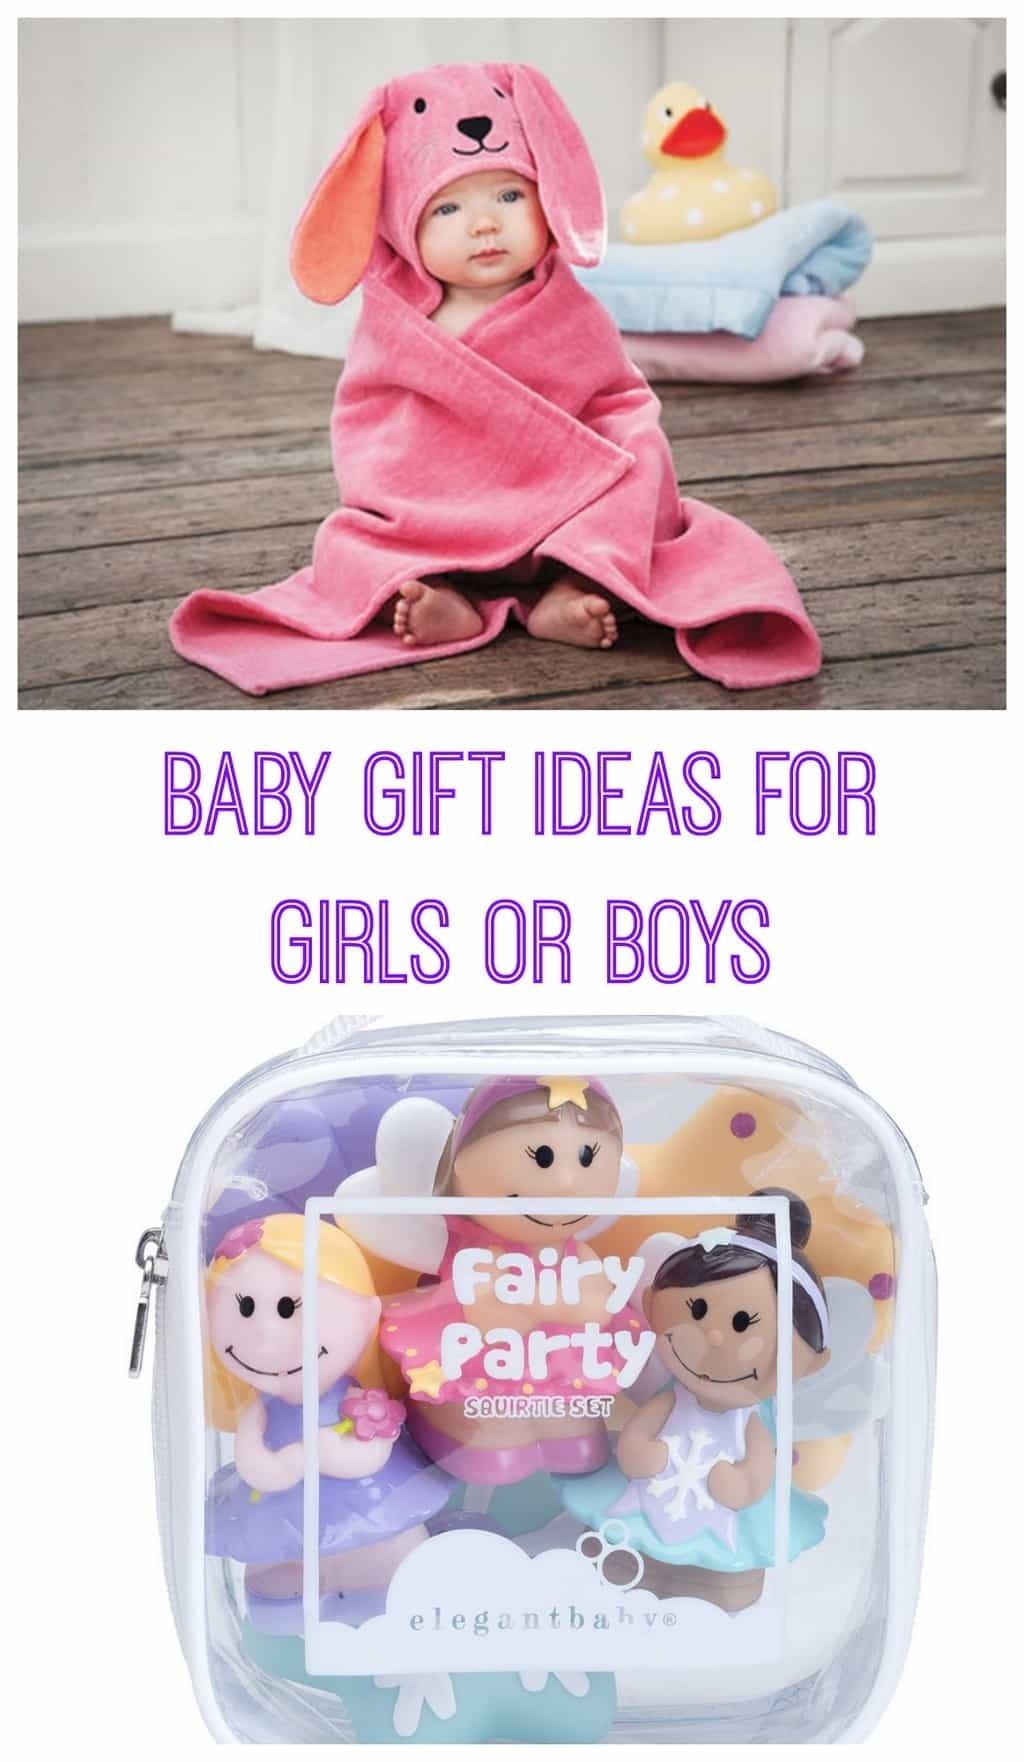 baby gift ideas for girls & boys